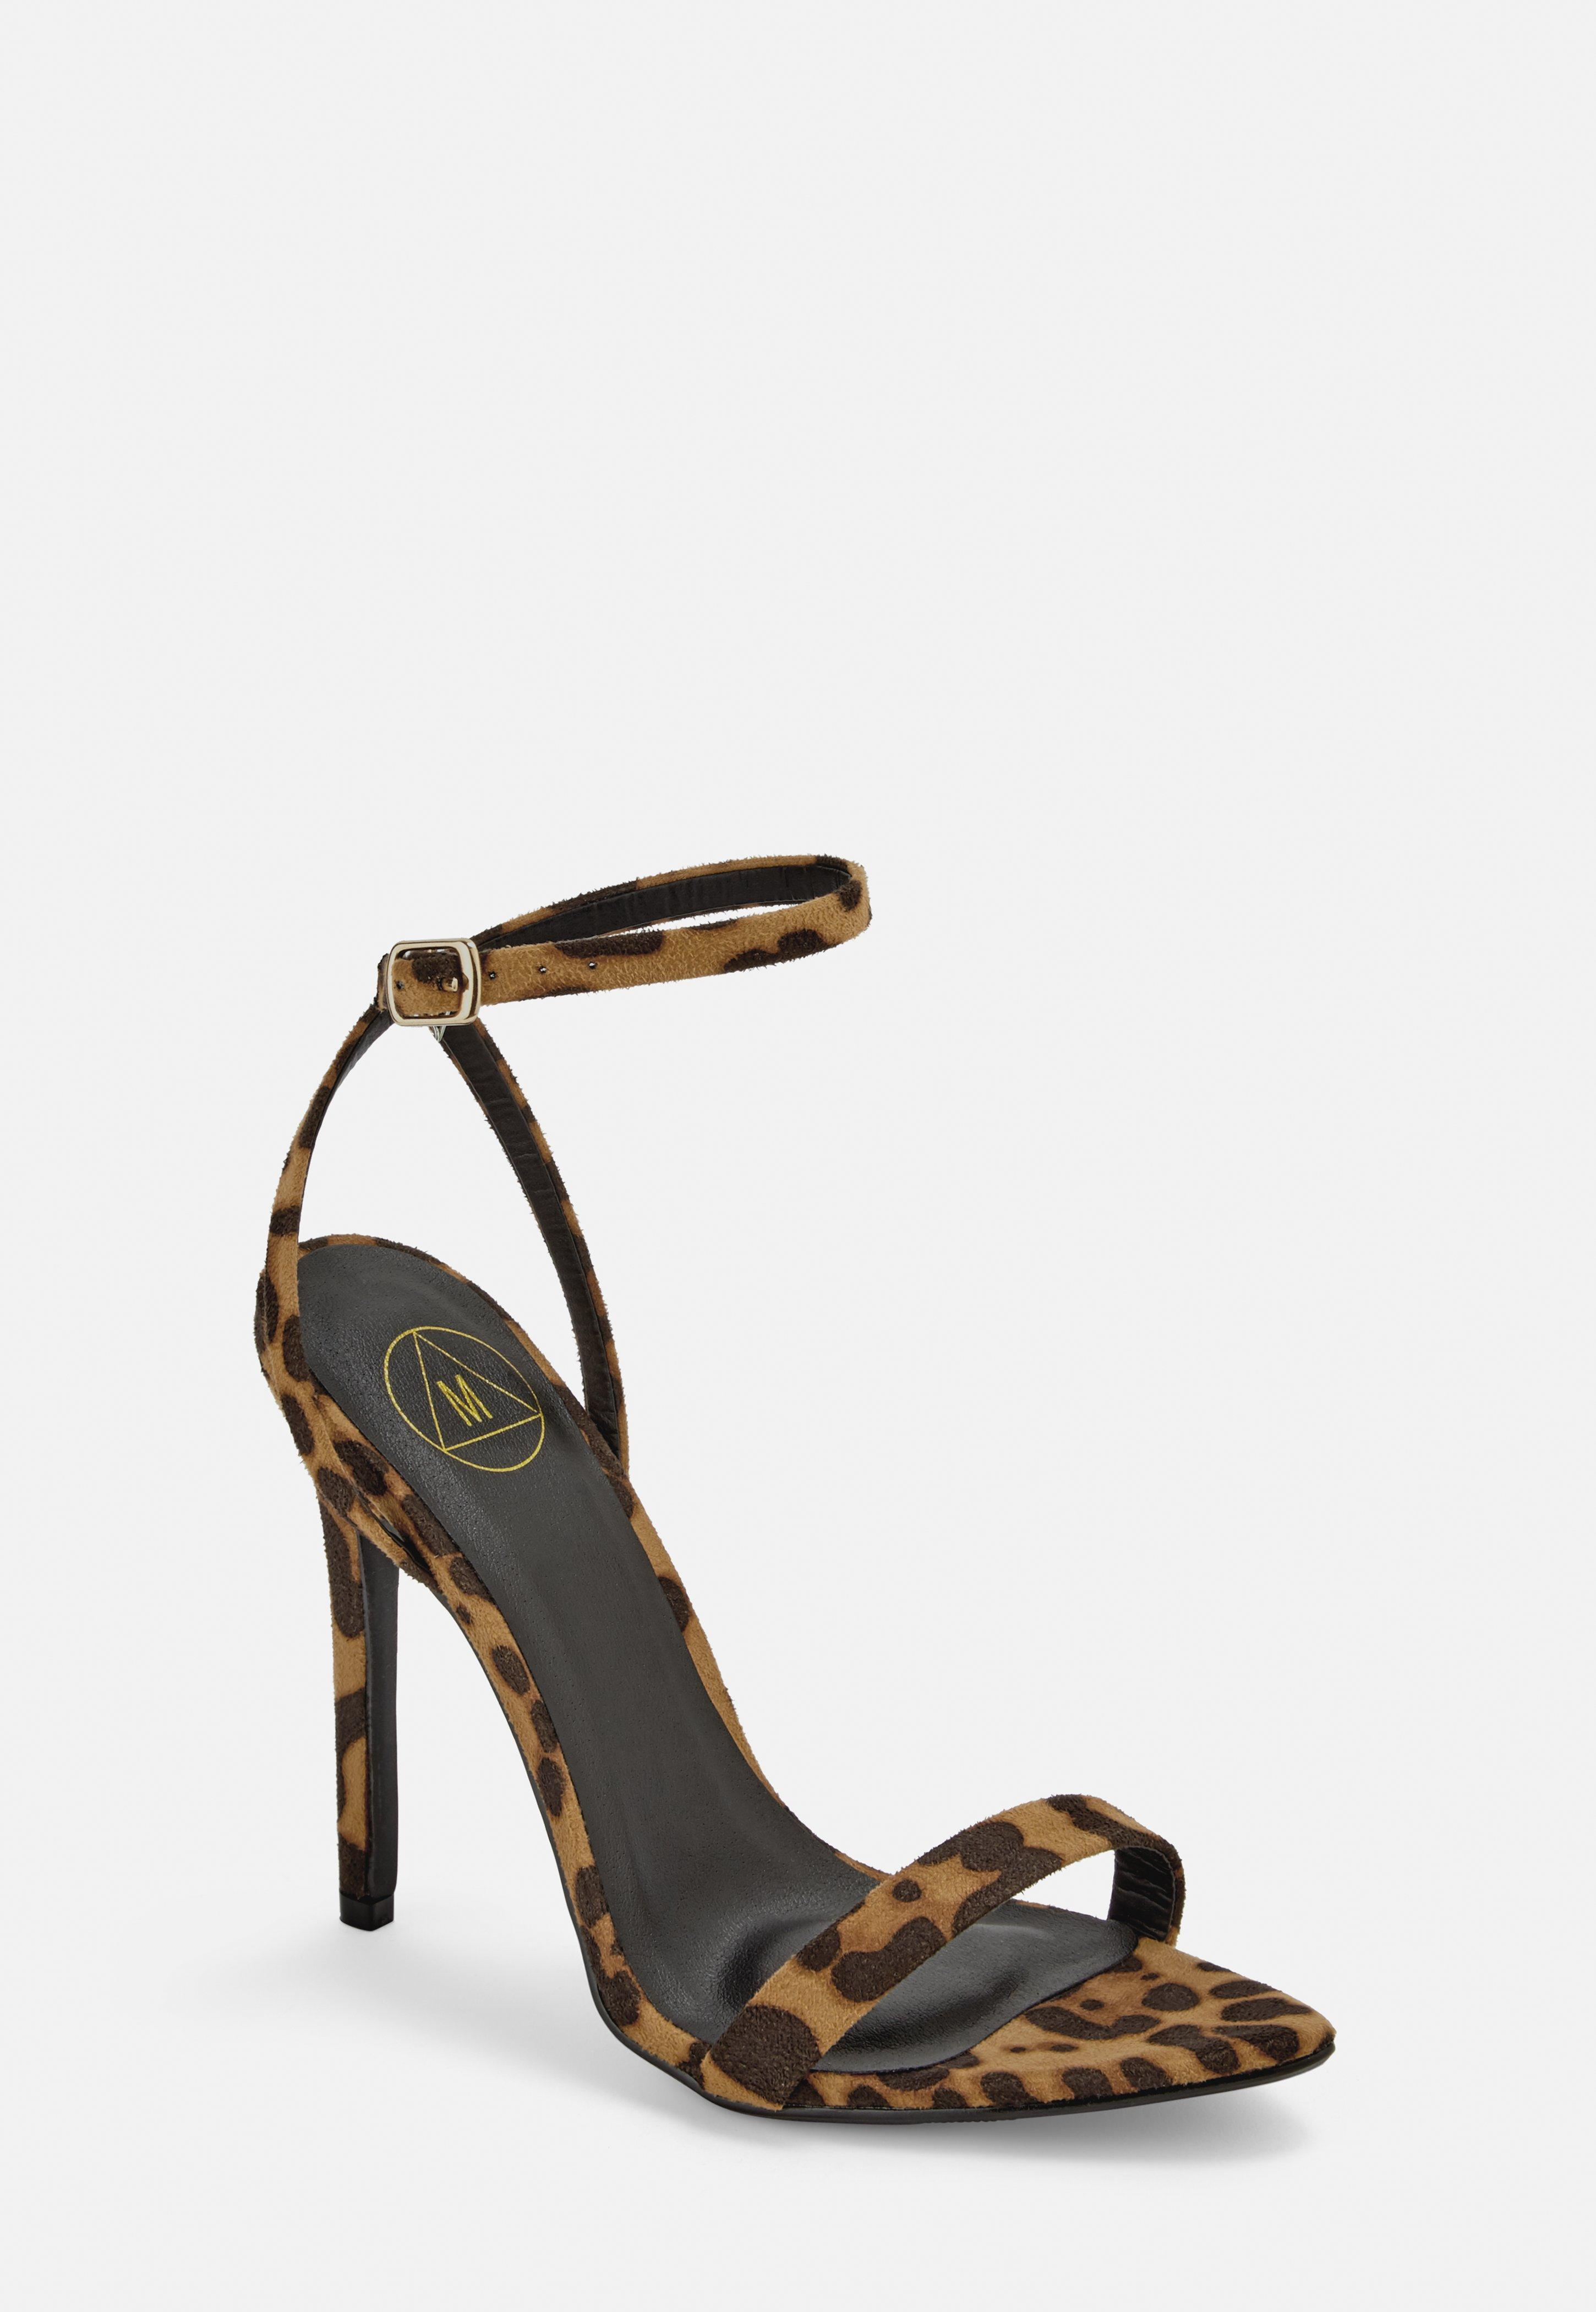 7ed6b38f0bc Shoes - Women's Footwear Online | Missguided Australia